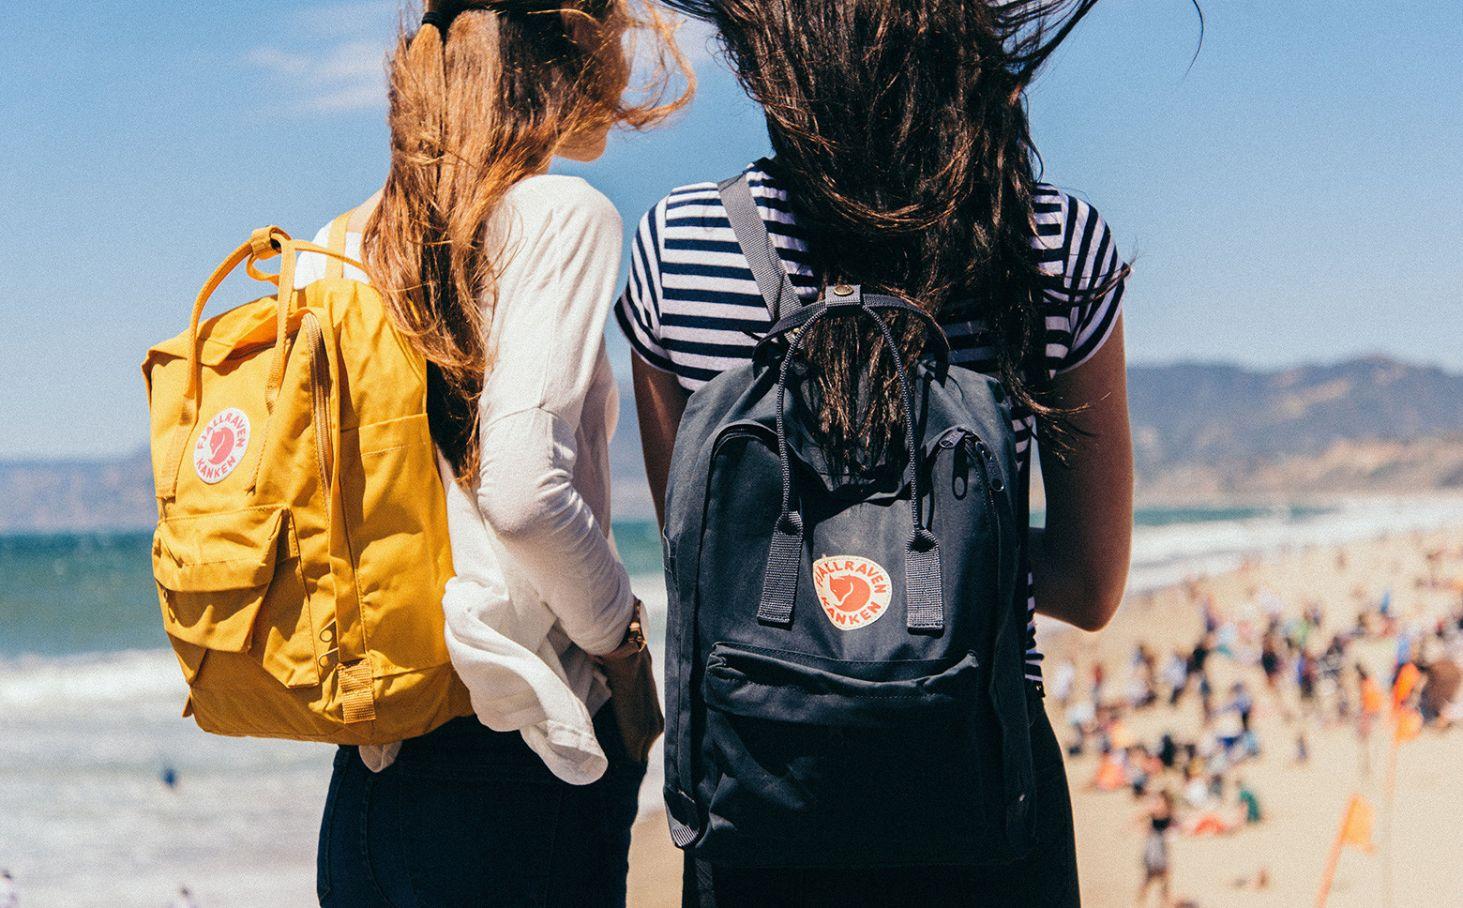 randki podczas plecaków